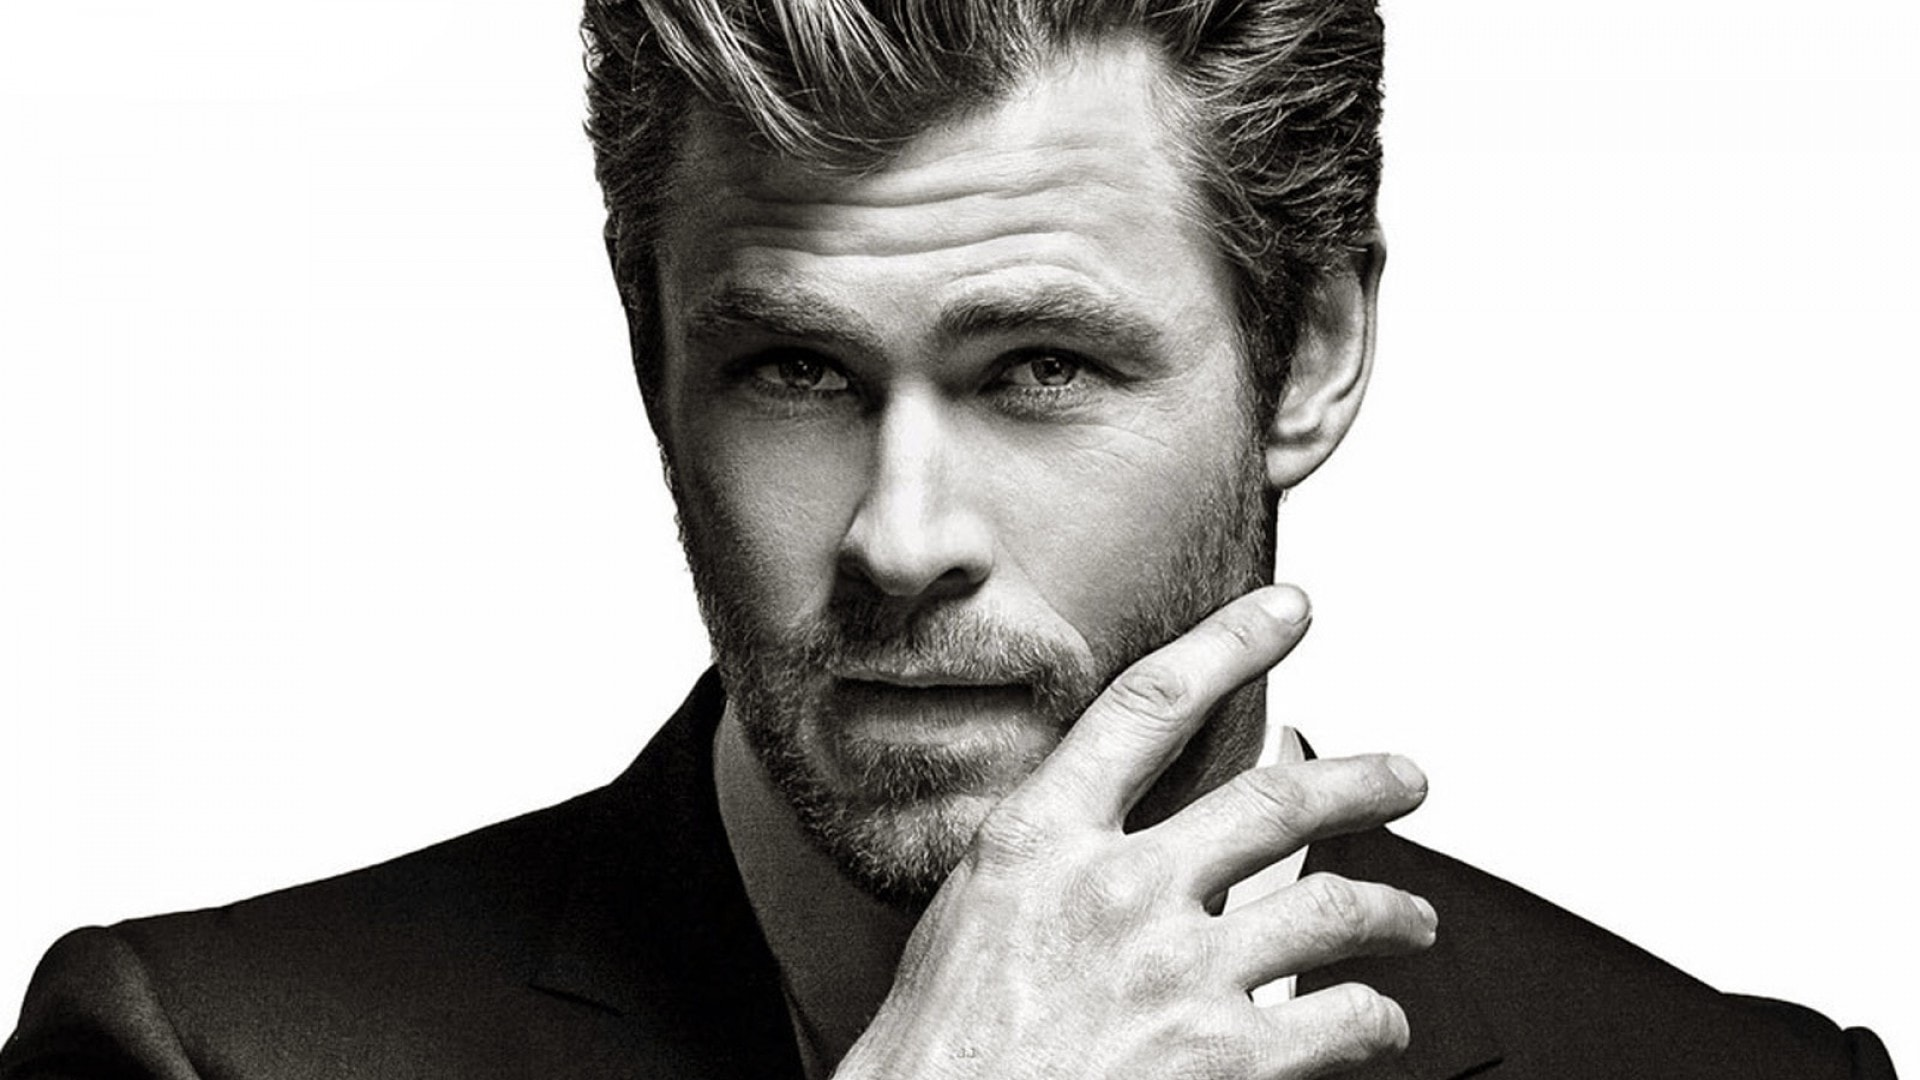 Chris Hemsworth Hd Wallpapers 7wallpapers